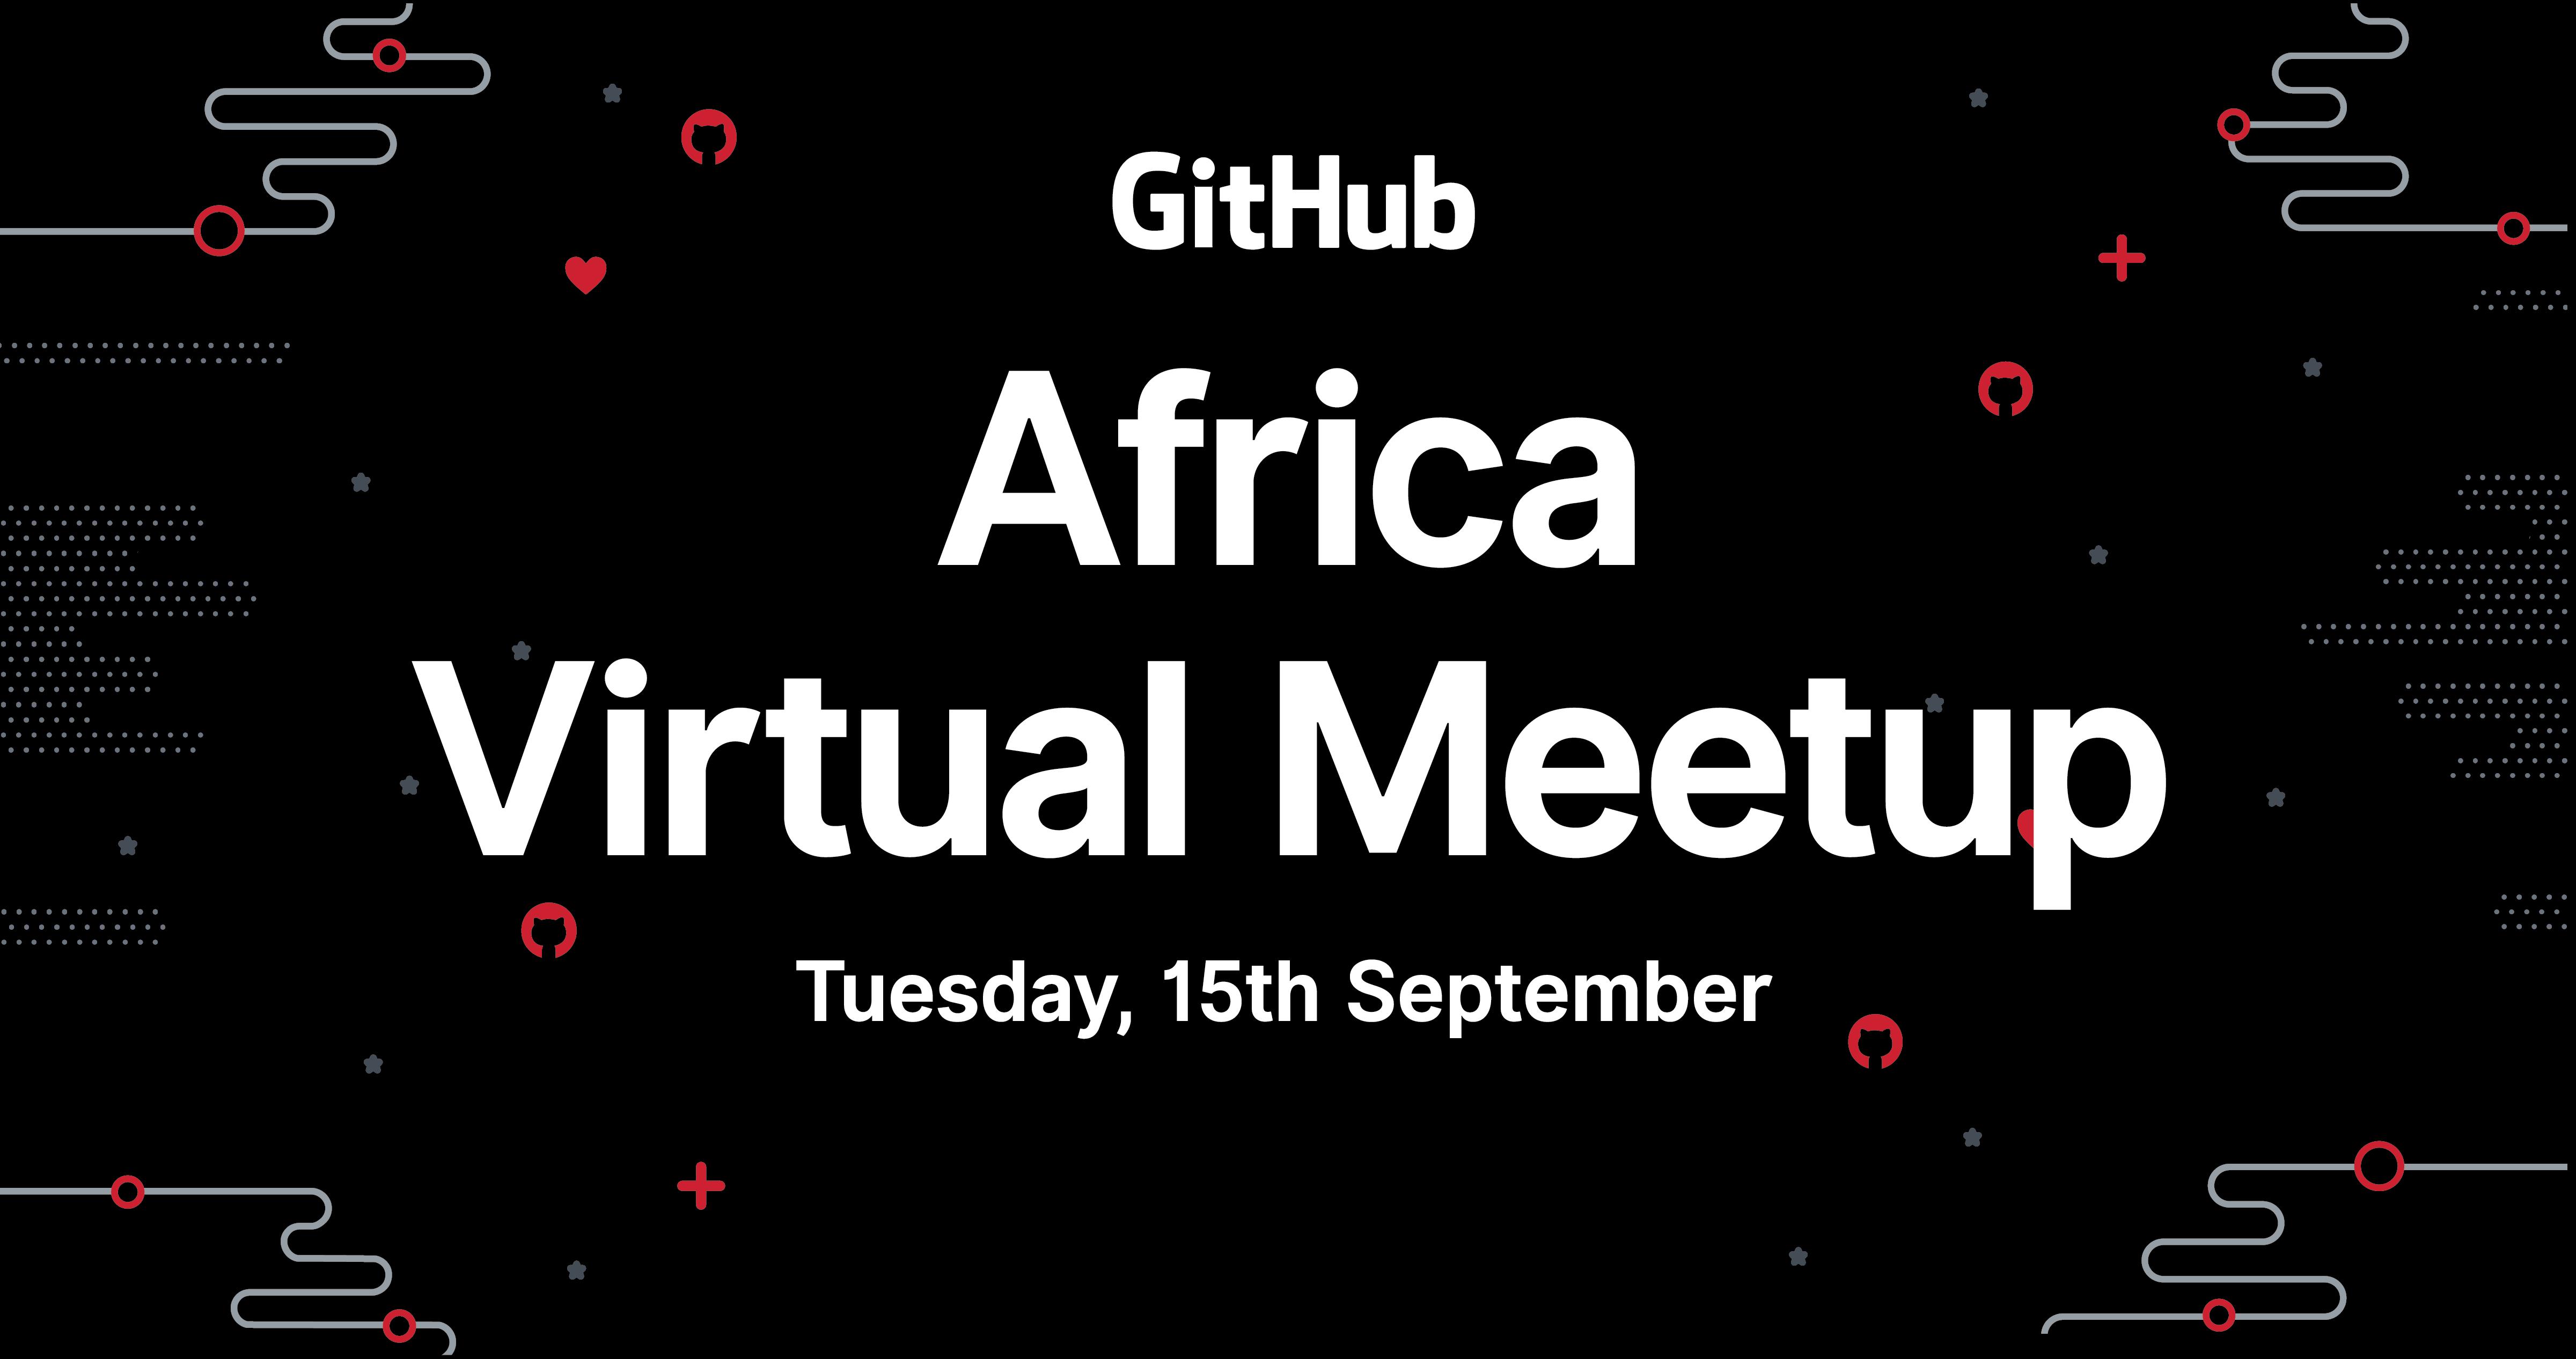 GitHub Africa Virtual Meetup